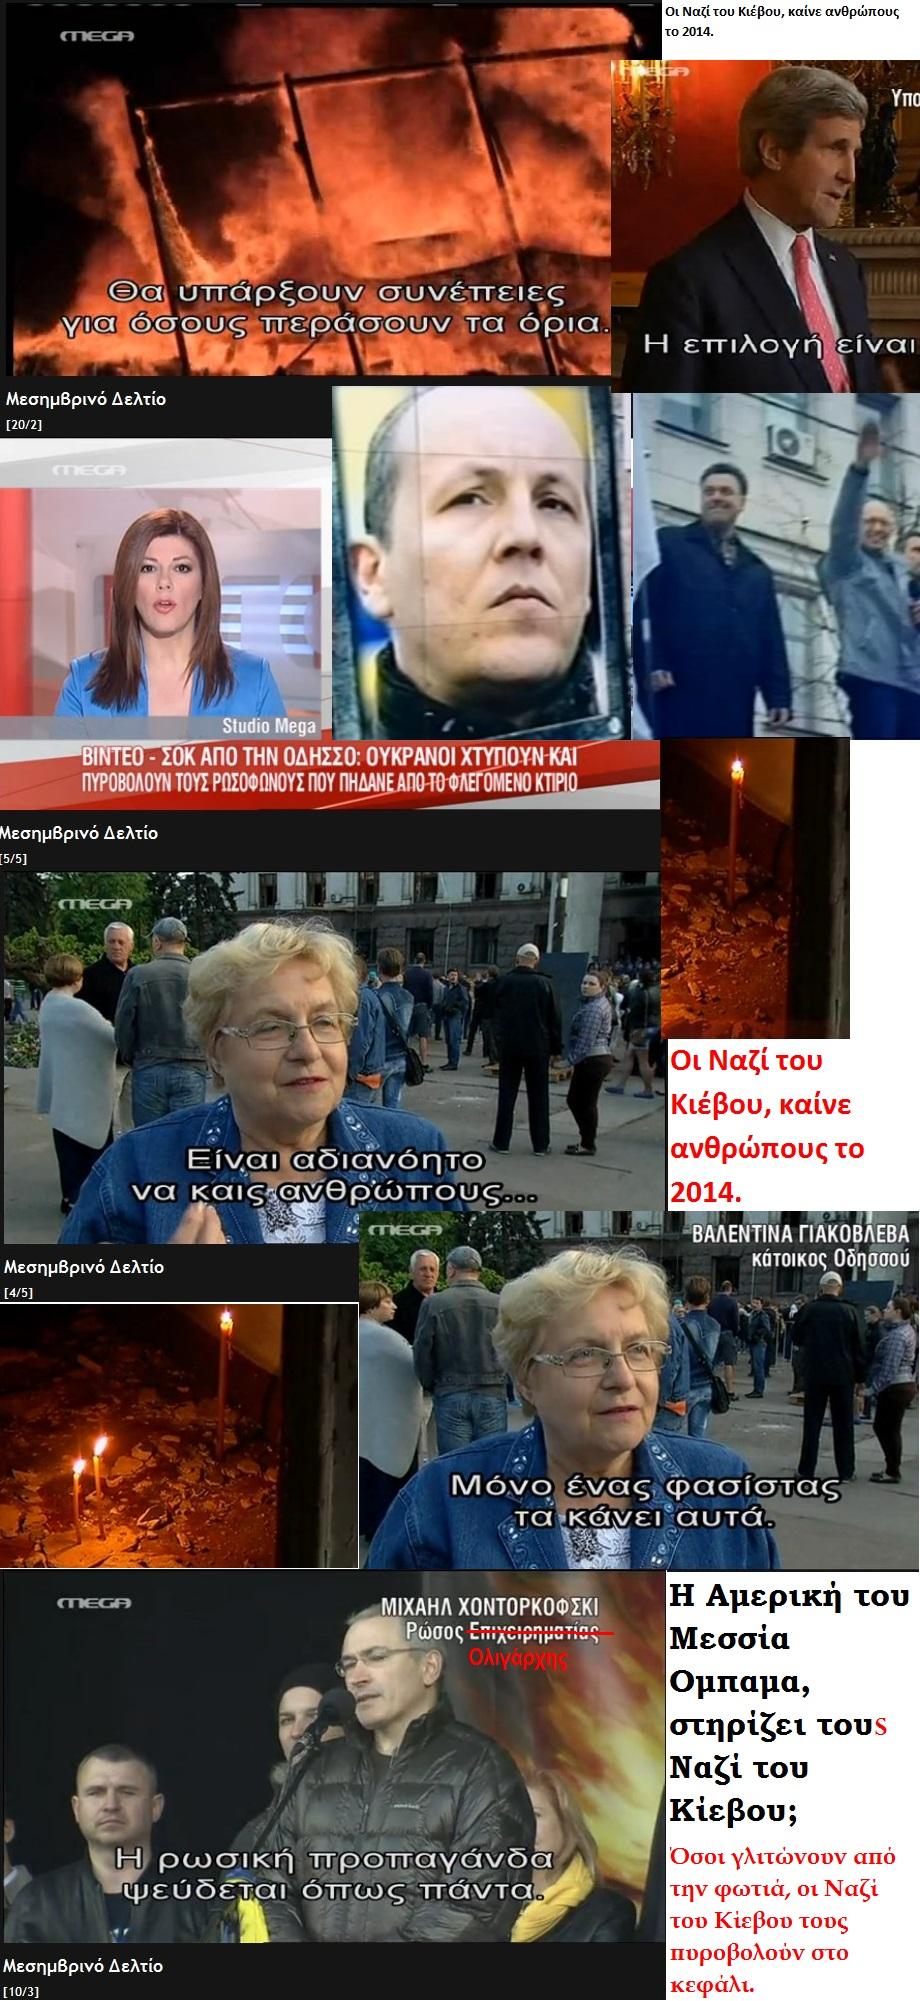 UKRAINE CRISIS ODHSOS FIRE  01 060514